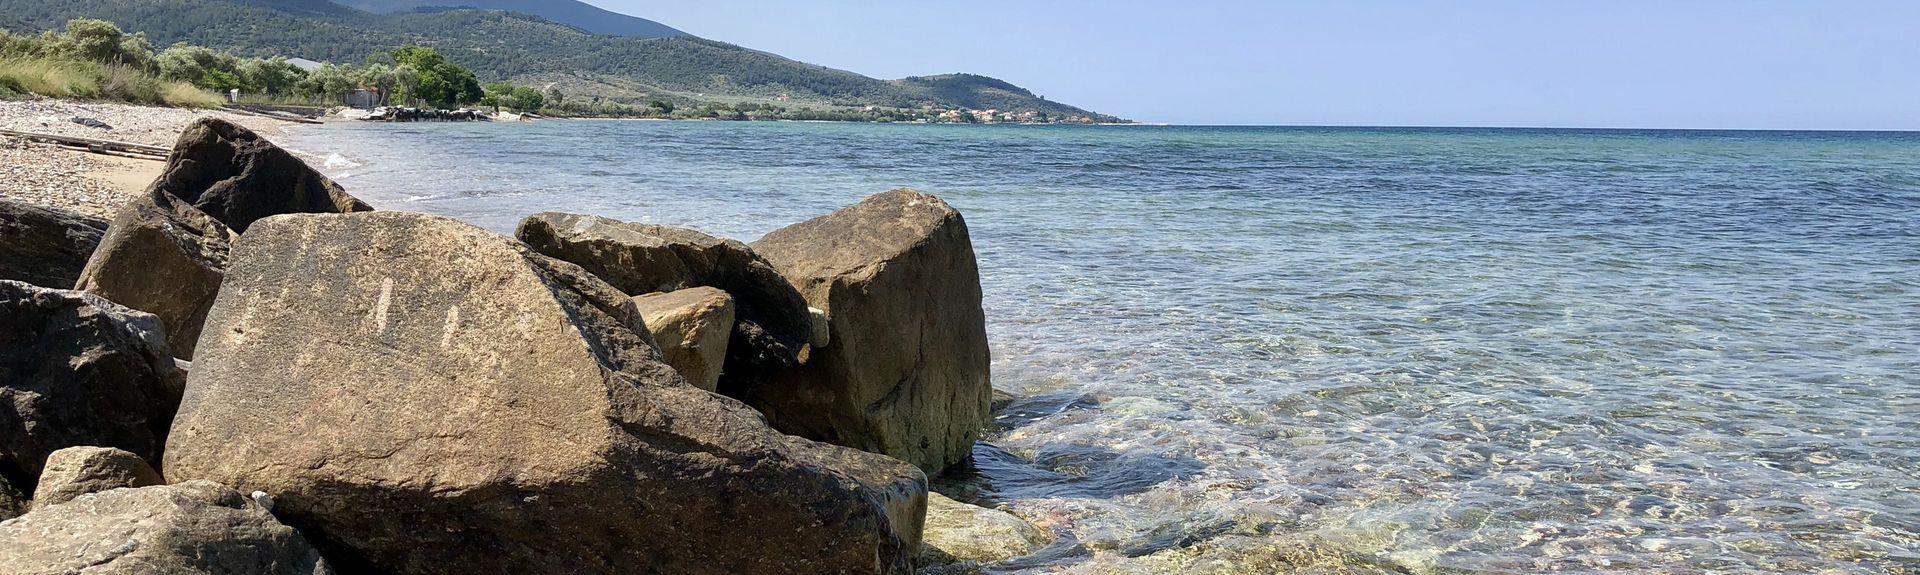 Makryammos Beach, Thasos, Greece